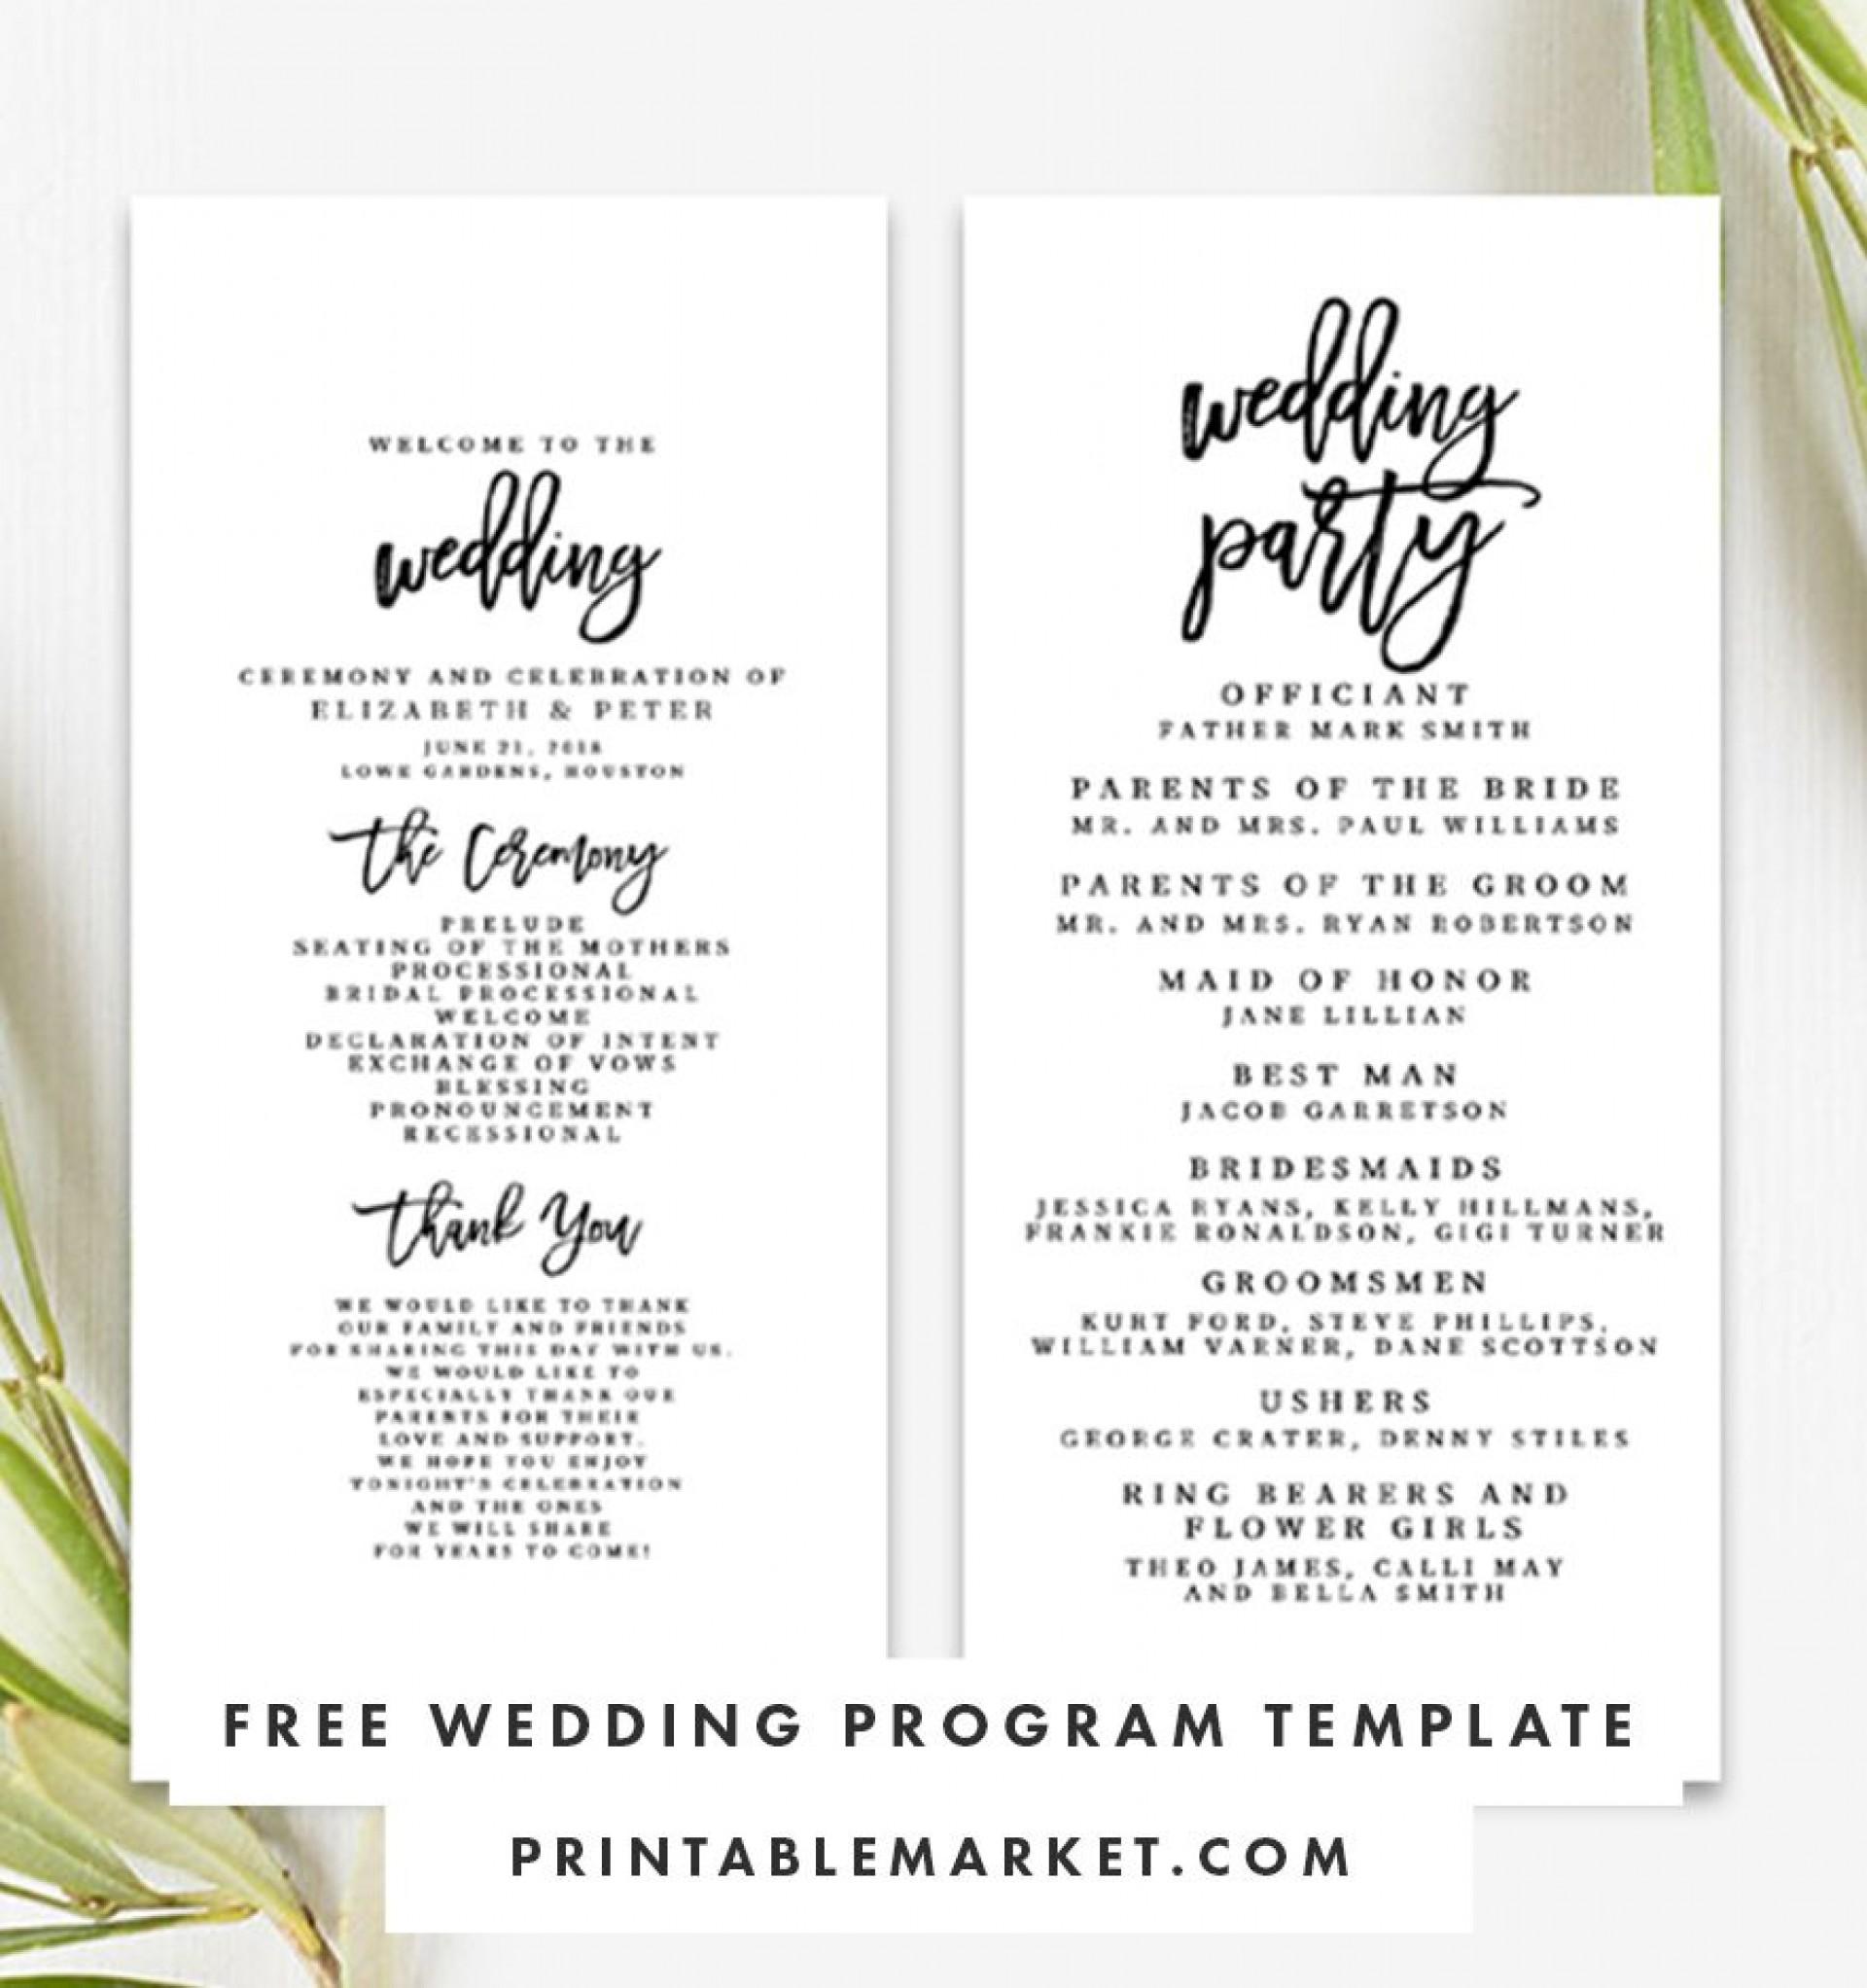 009 Striking Free Template For Wedding Ceremony Program Highest Quality 1920